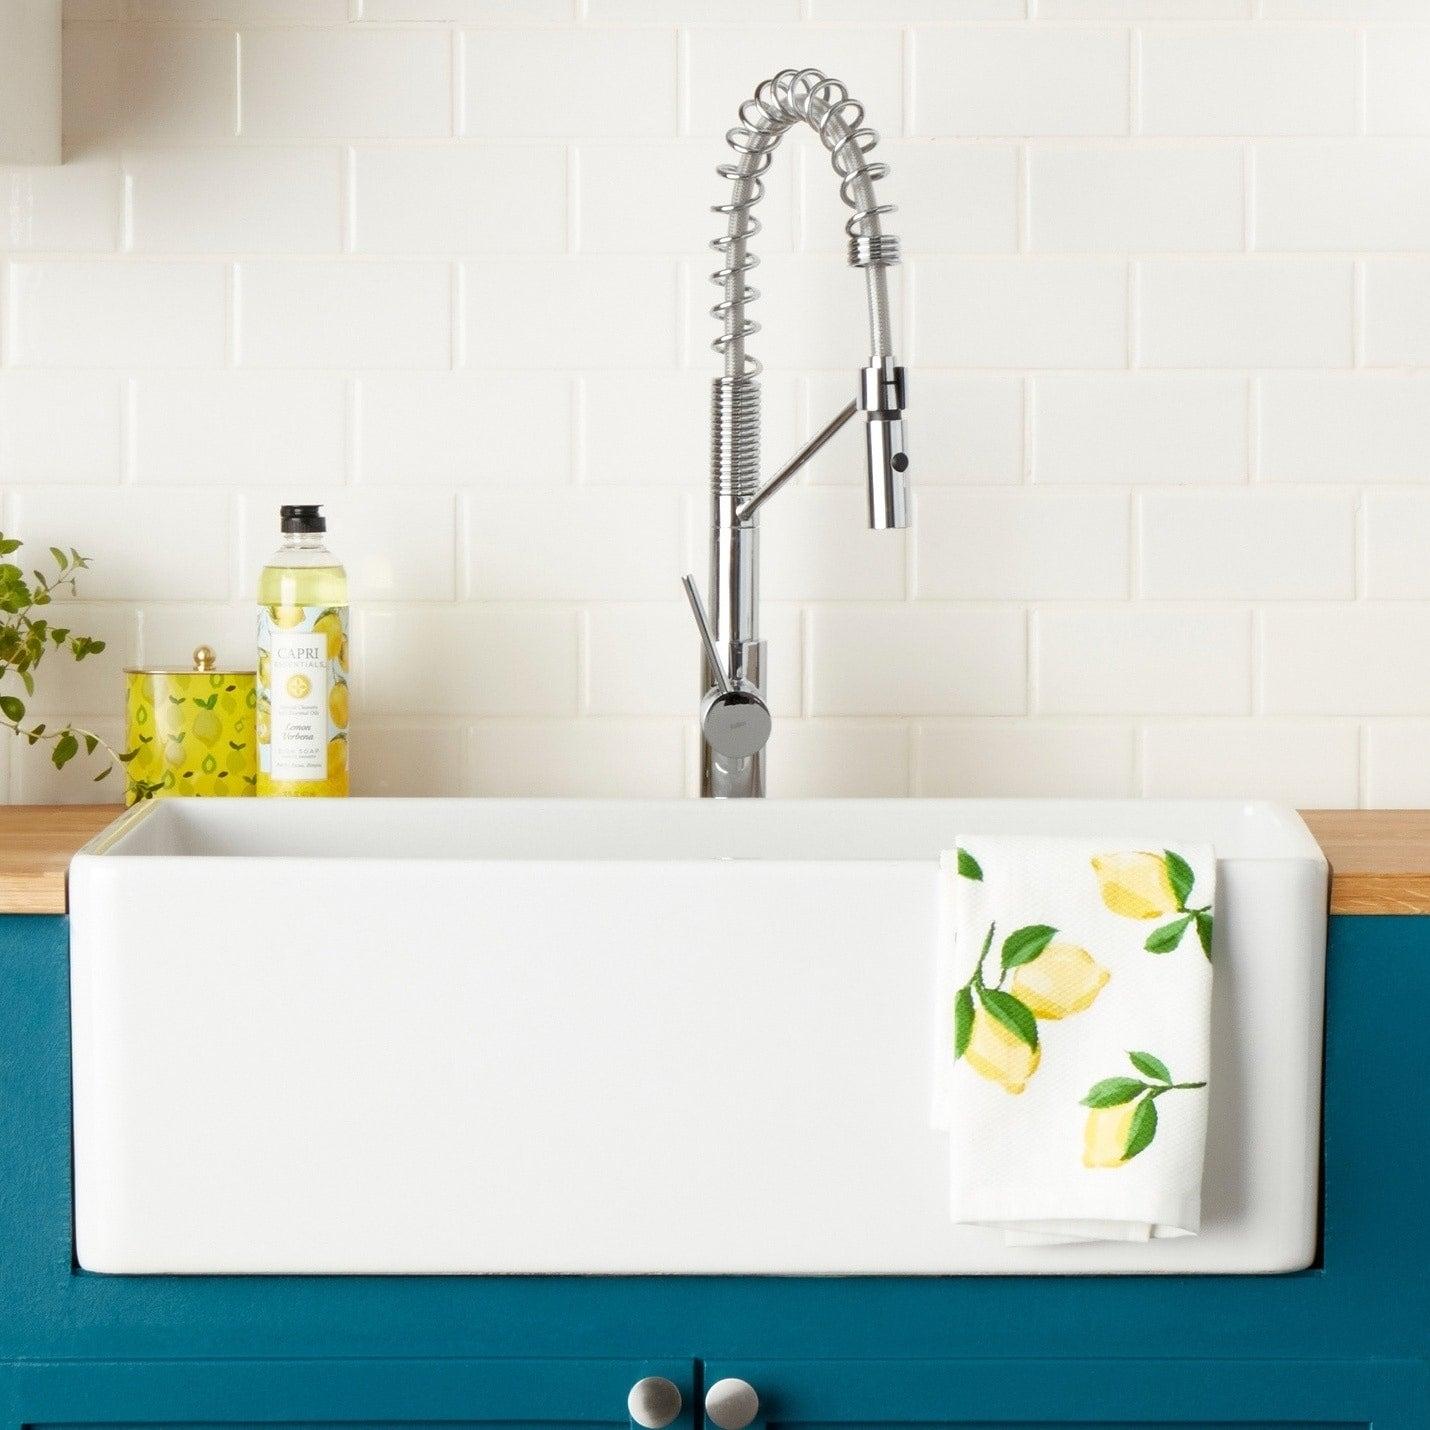 Farmhouse Kitchen Sink | Shop Highpoint Collection 30 Inch Single Bowl Fireclay Farmhouse